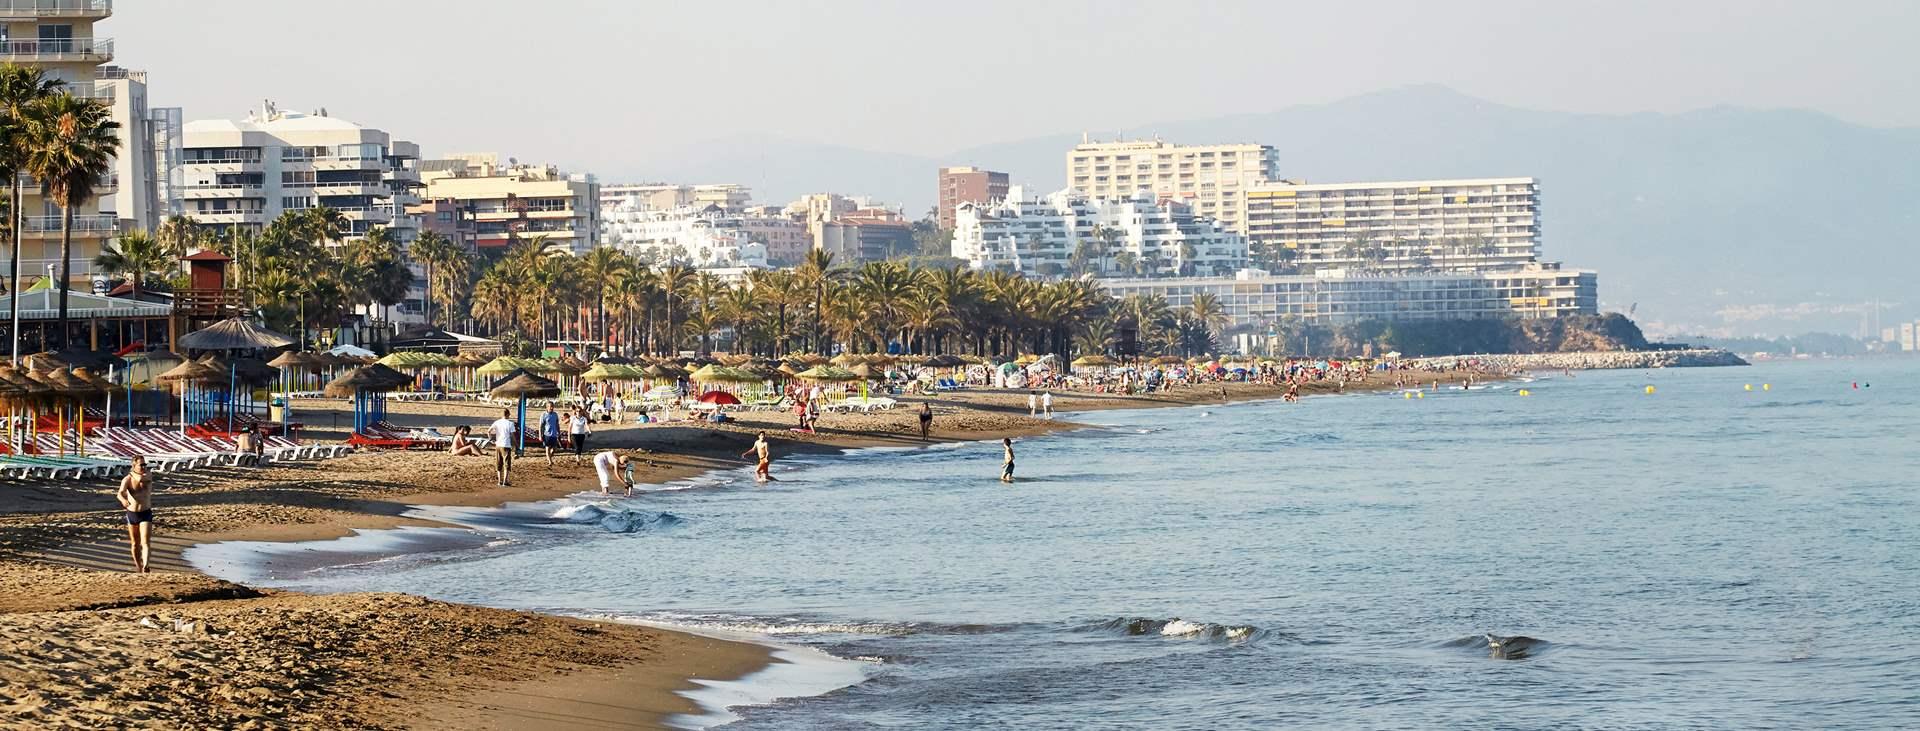 Matkat Benalmadenaan, Costa del Solille Espanjaan